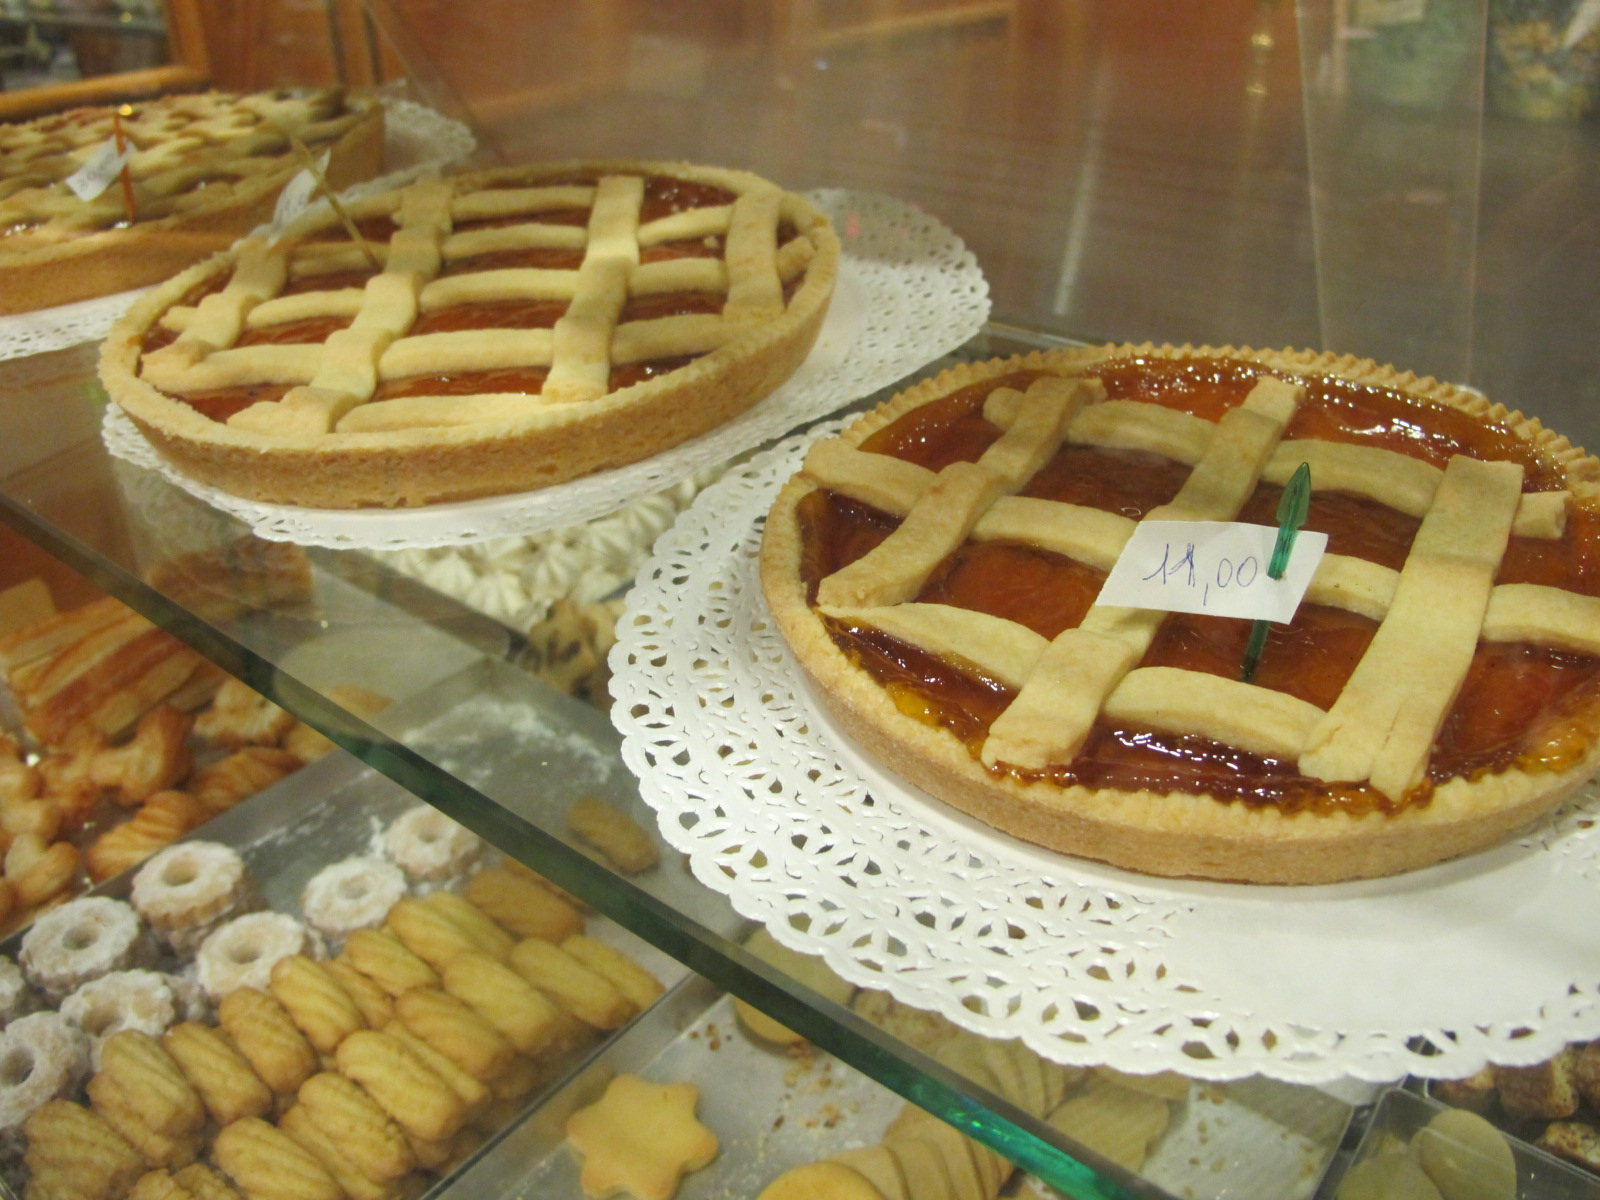 La pâtisserie Fugazza, amaretti et vieilles dentelles…